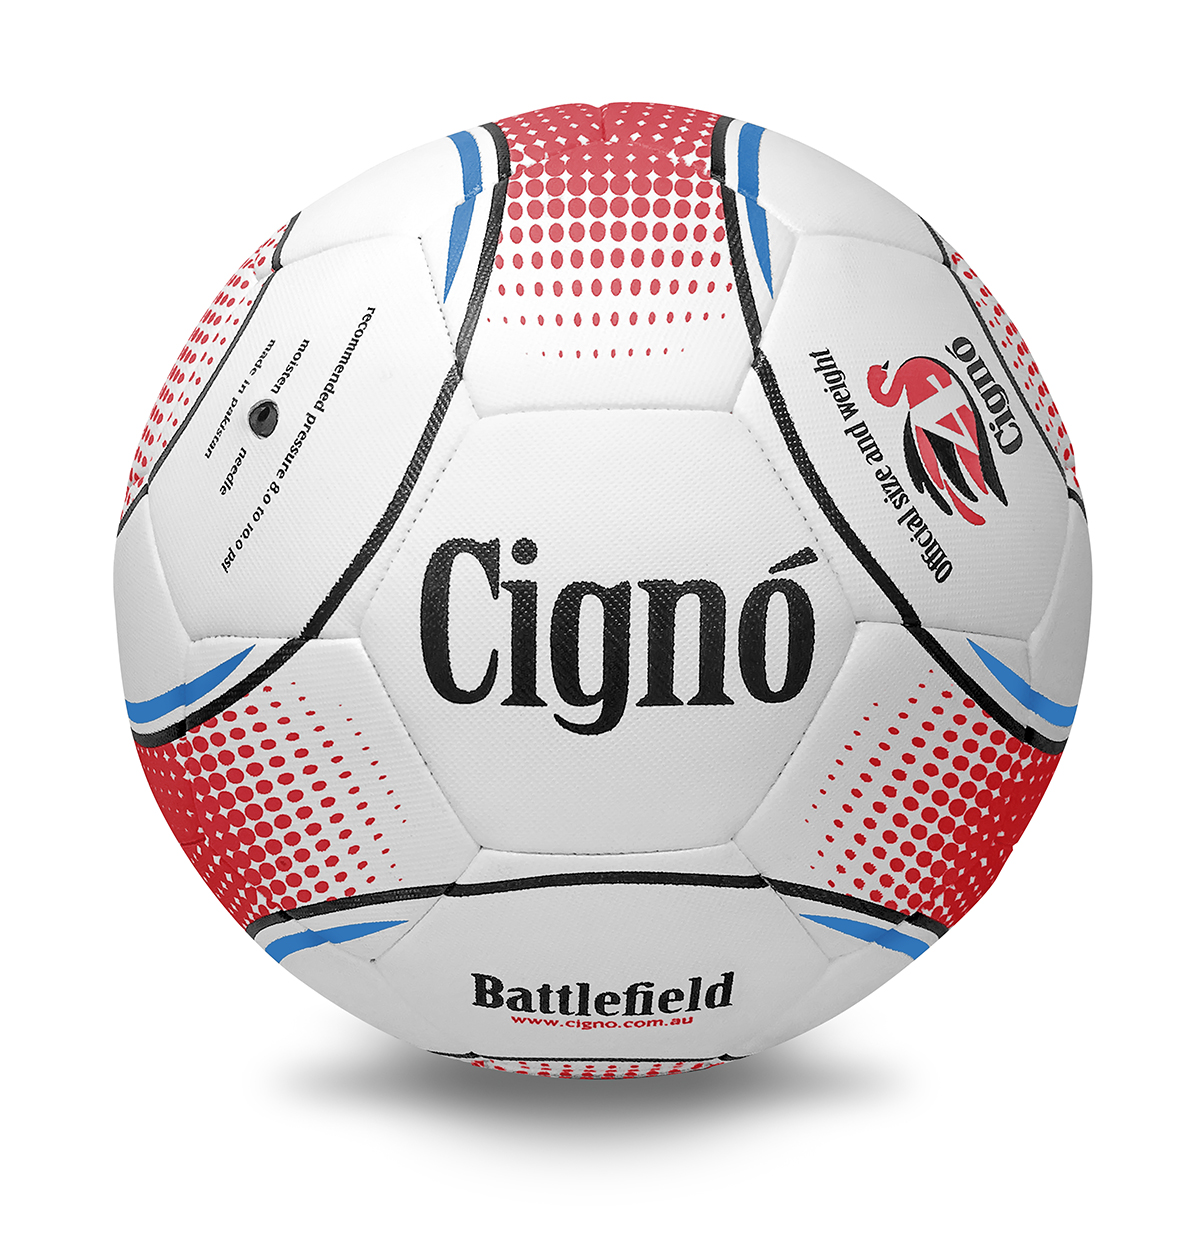 Cigno Battlefield Football